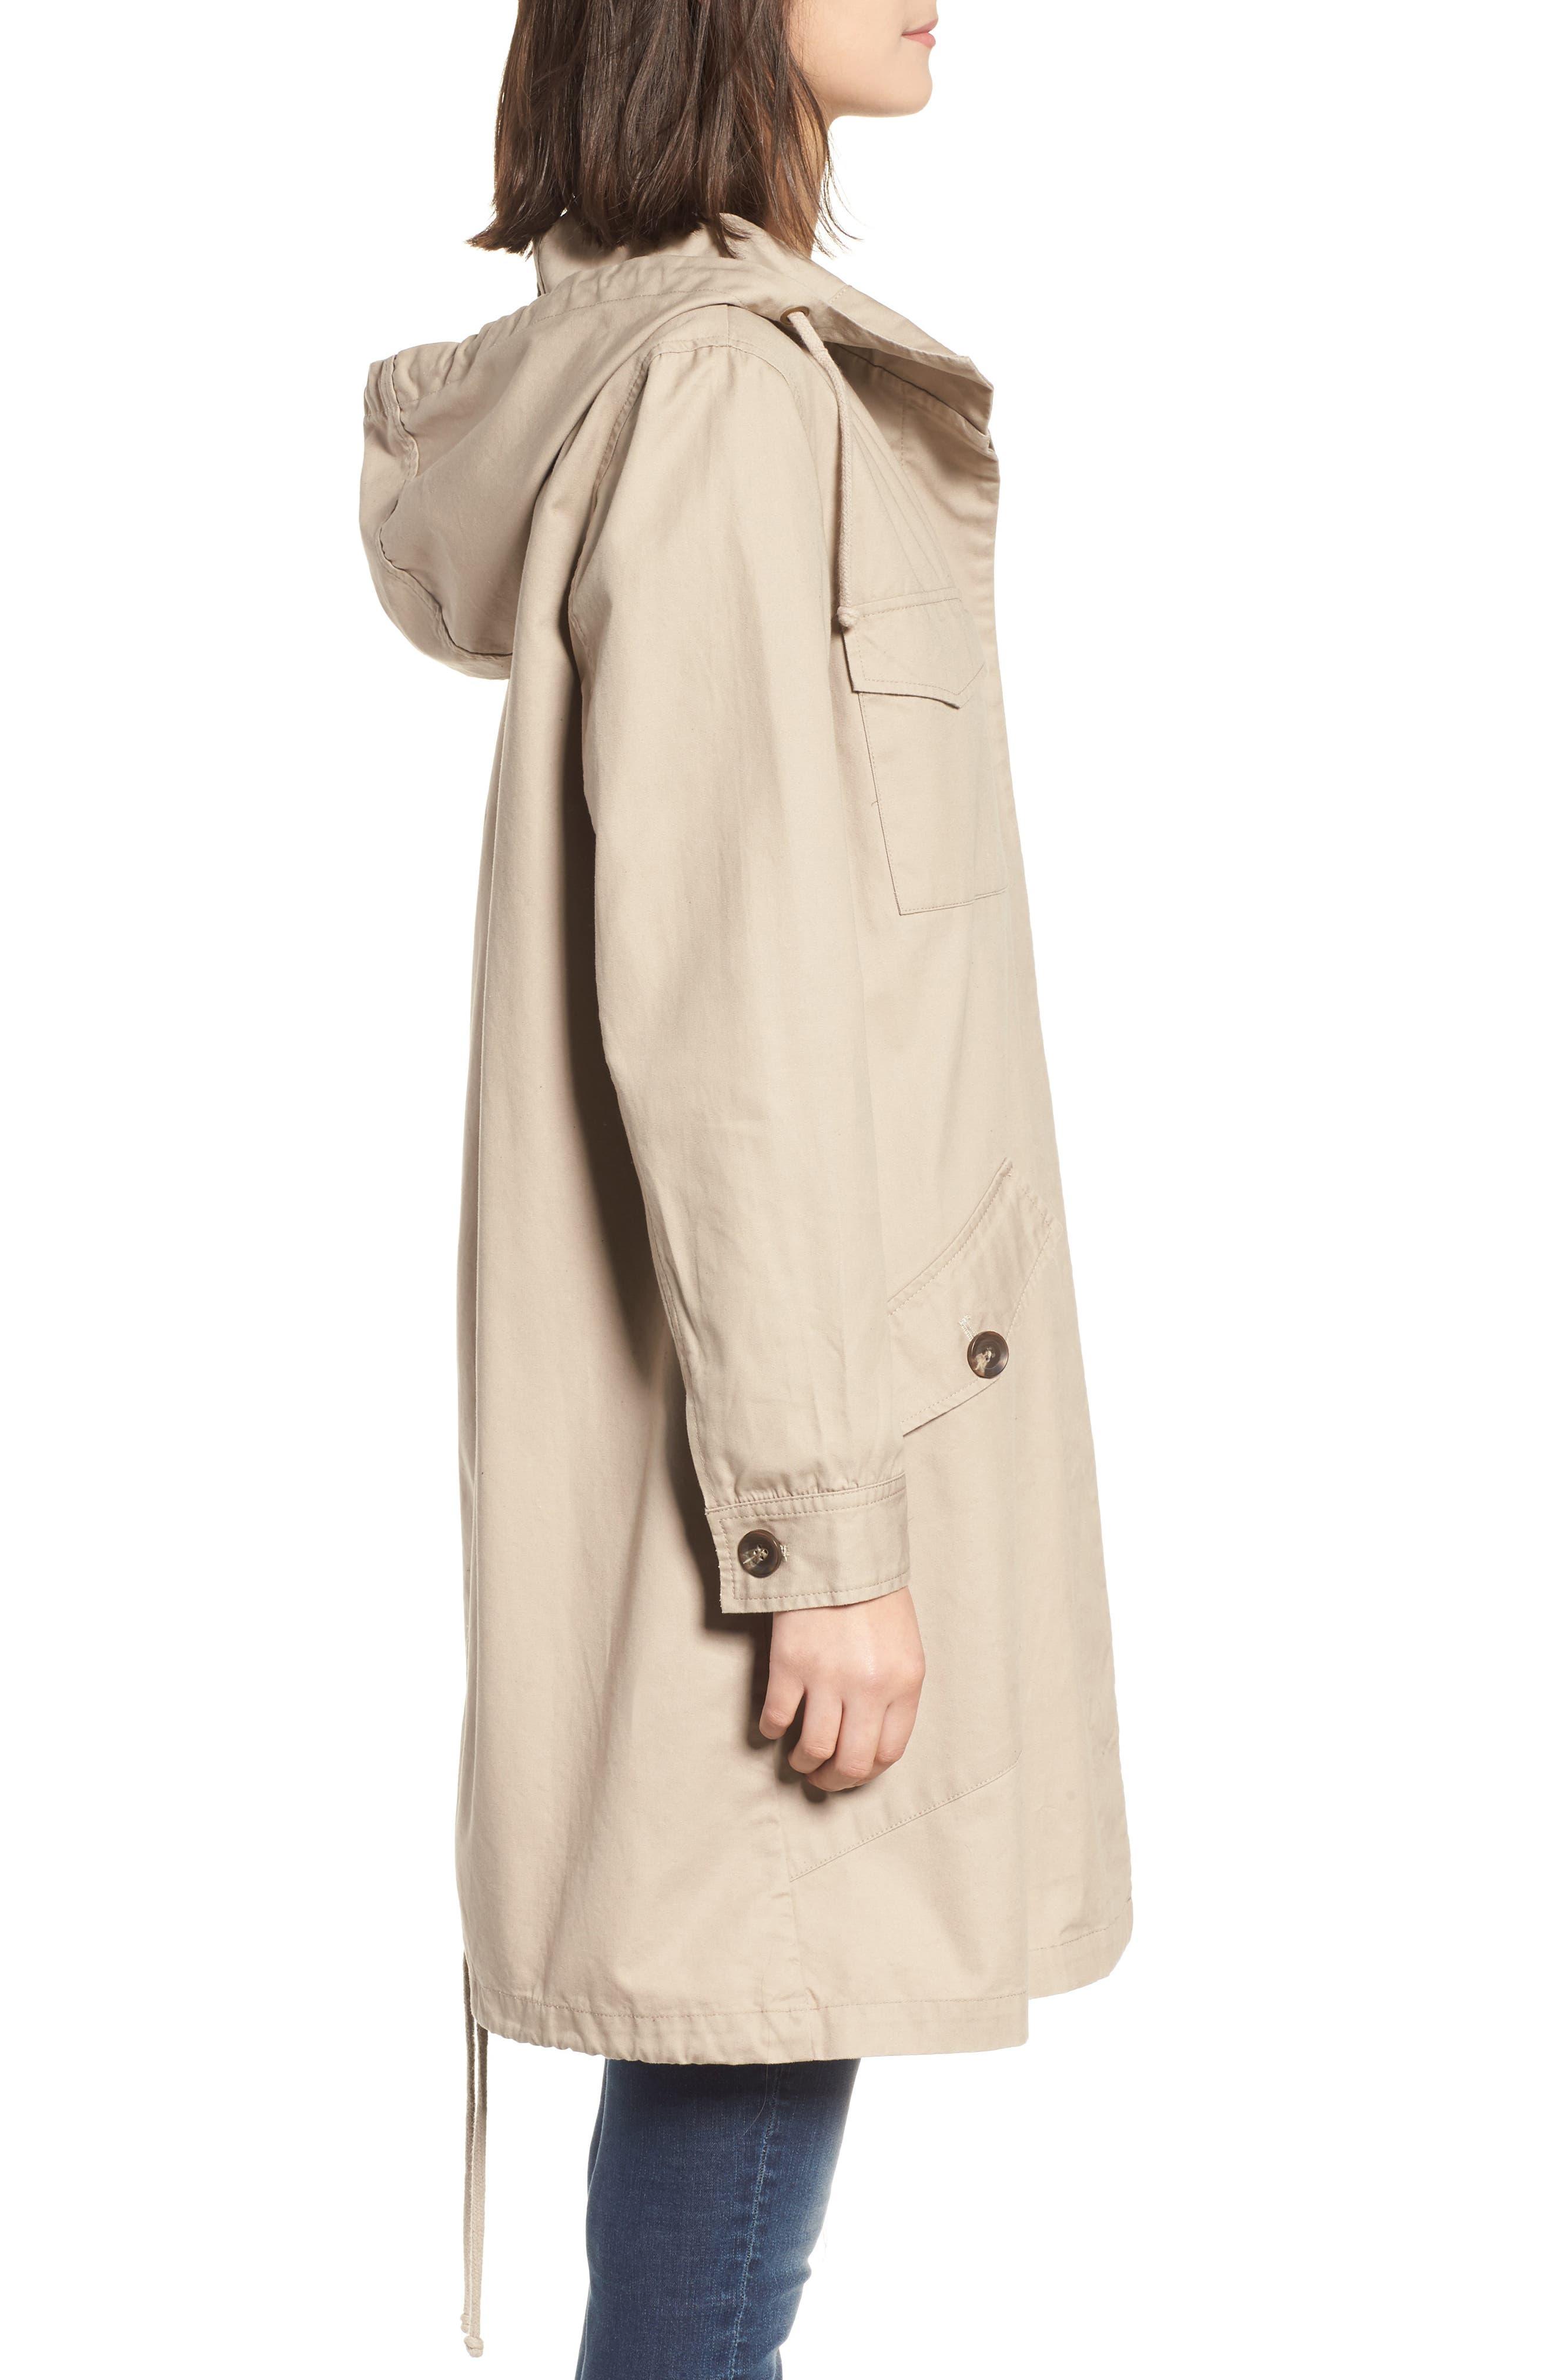 Noah Cotton Twill Coat,                             Alternate thumbnail 3, color,                             Cobblestone